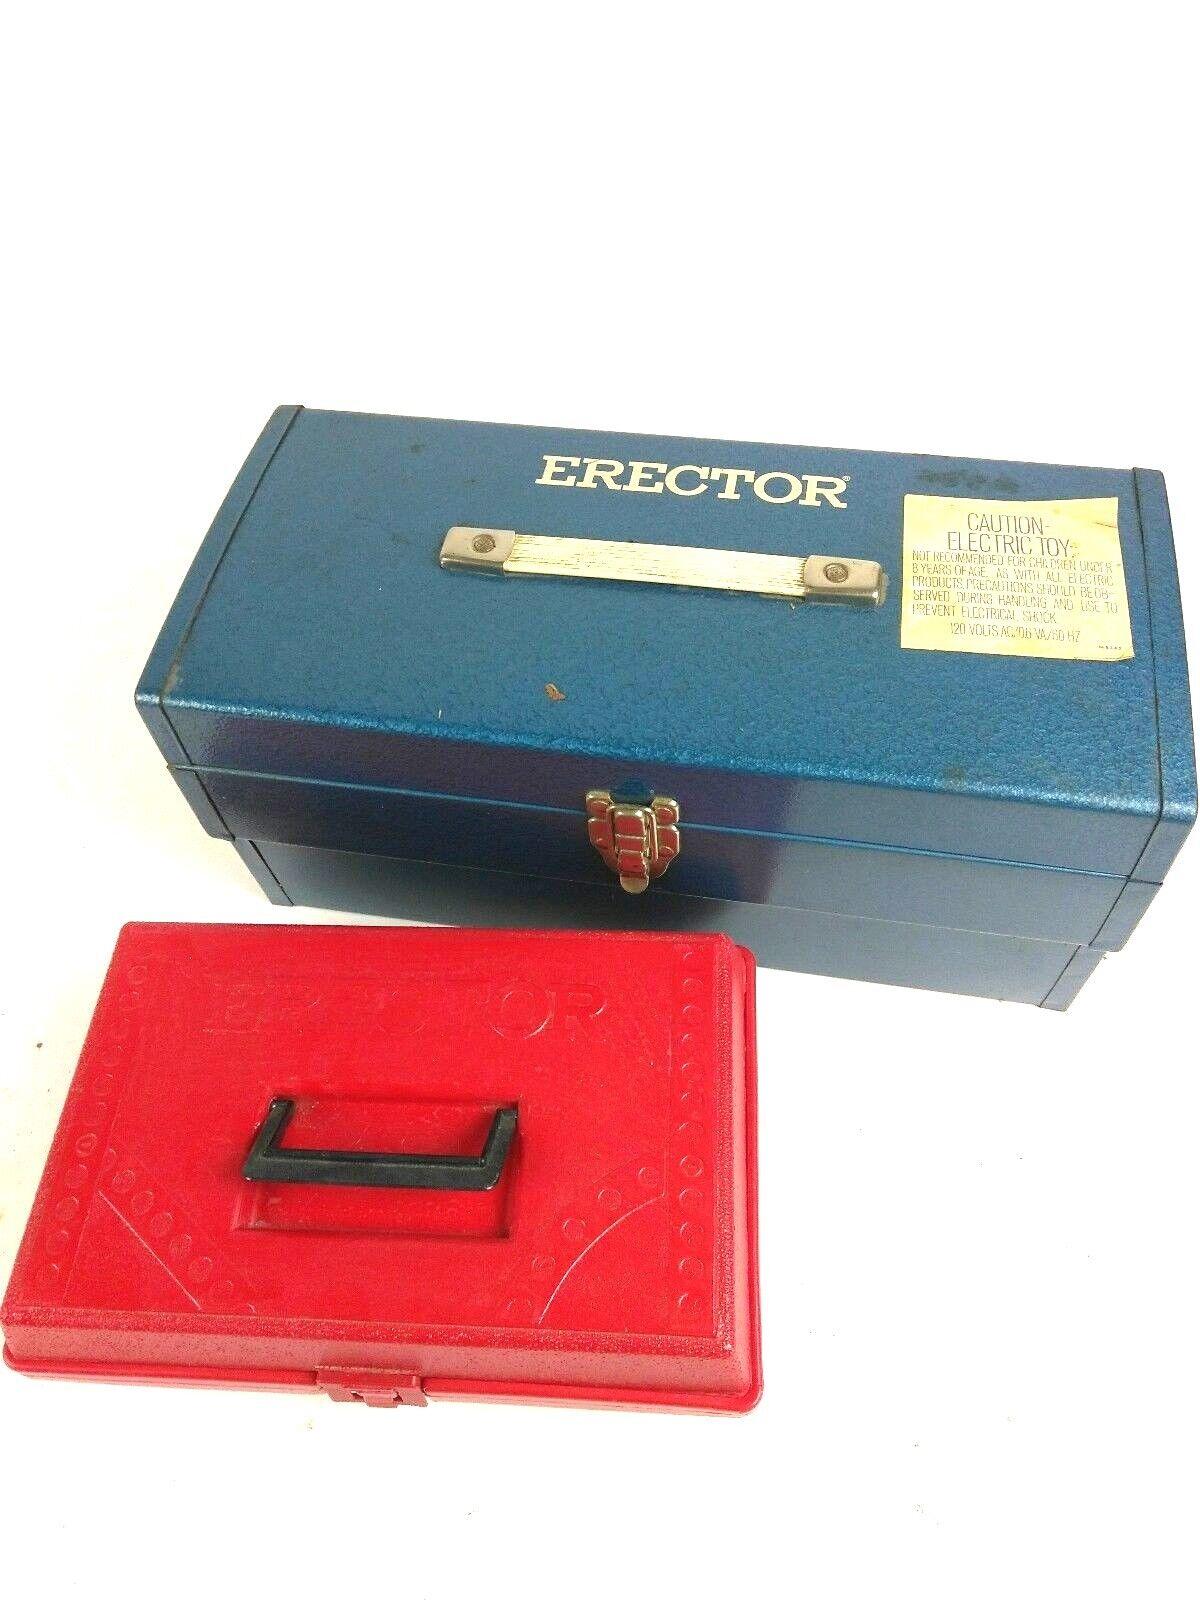 Enorme Lote de colección de Gilberts Erector Set - 16 libras total-motor-Excelente Estado